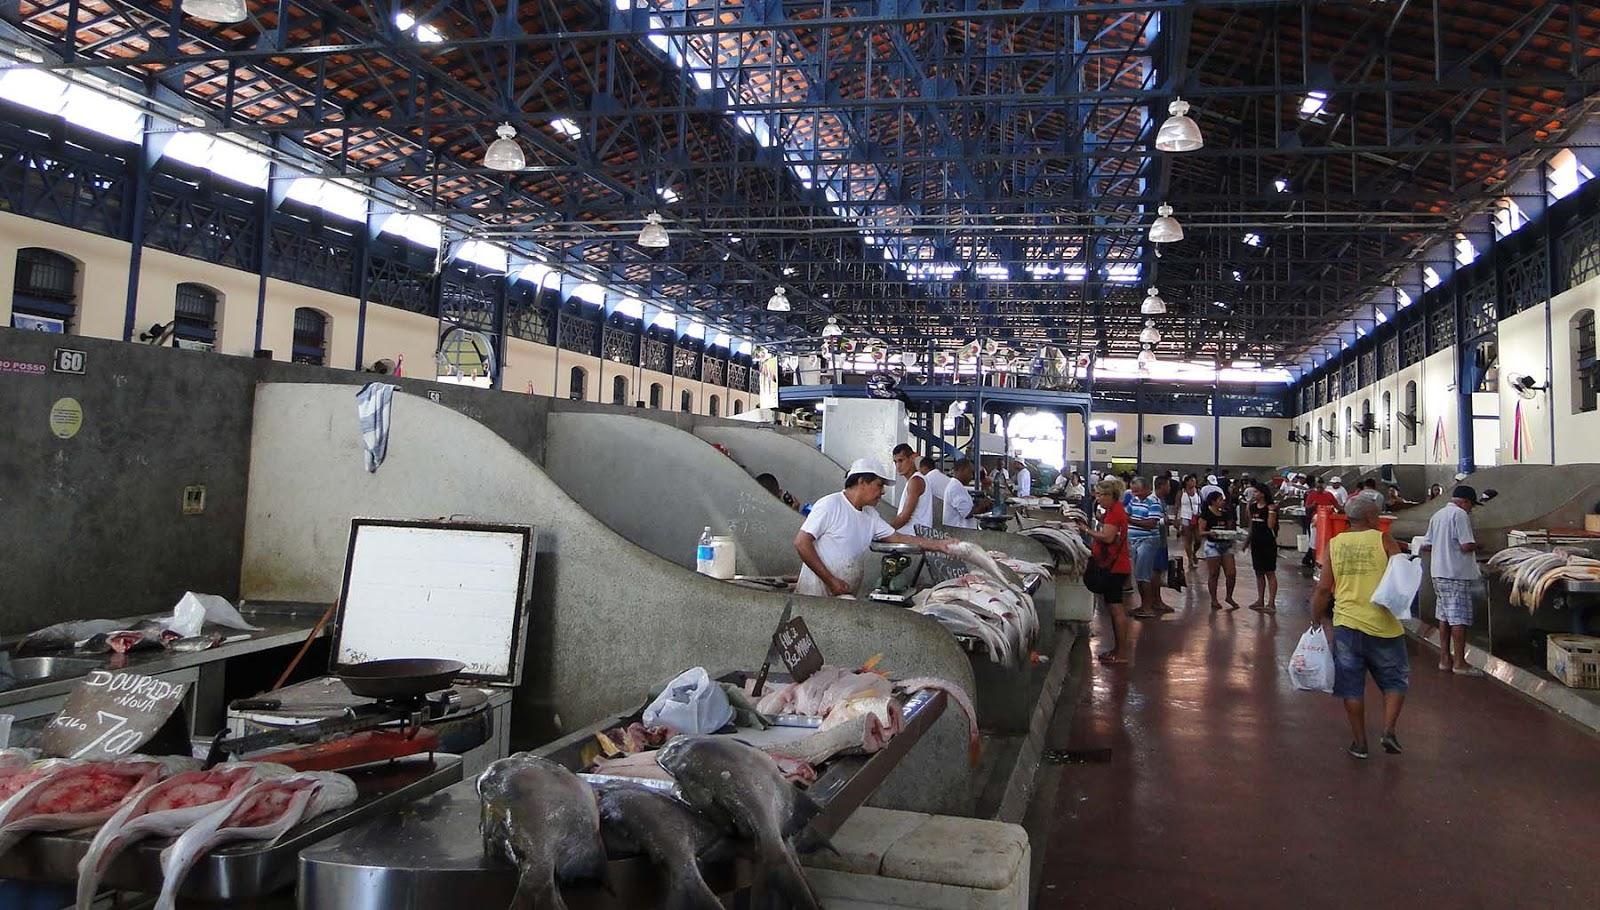 Mercado de Peixes, Belém do Pará.